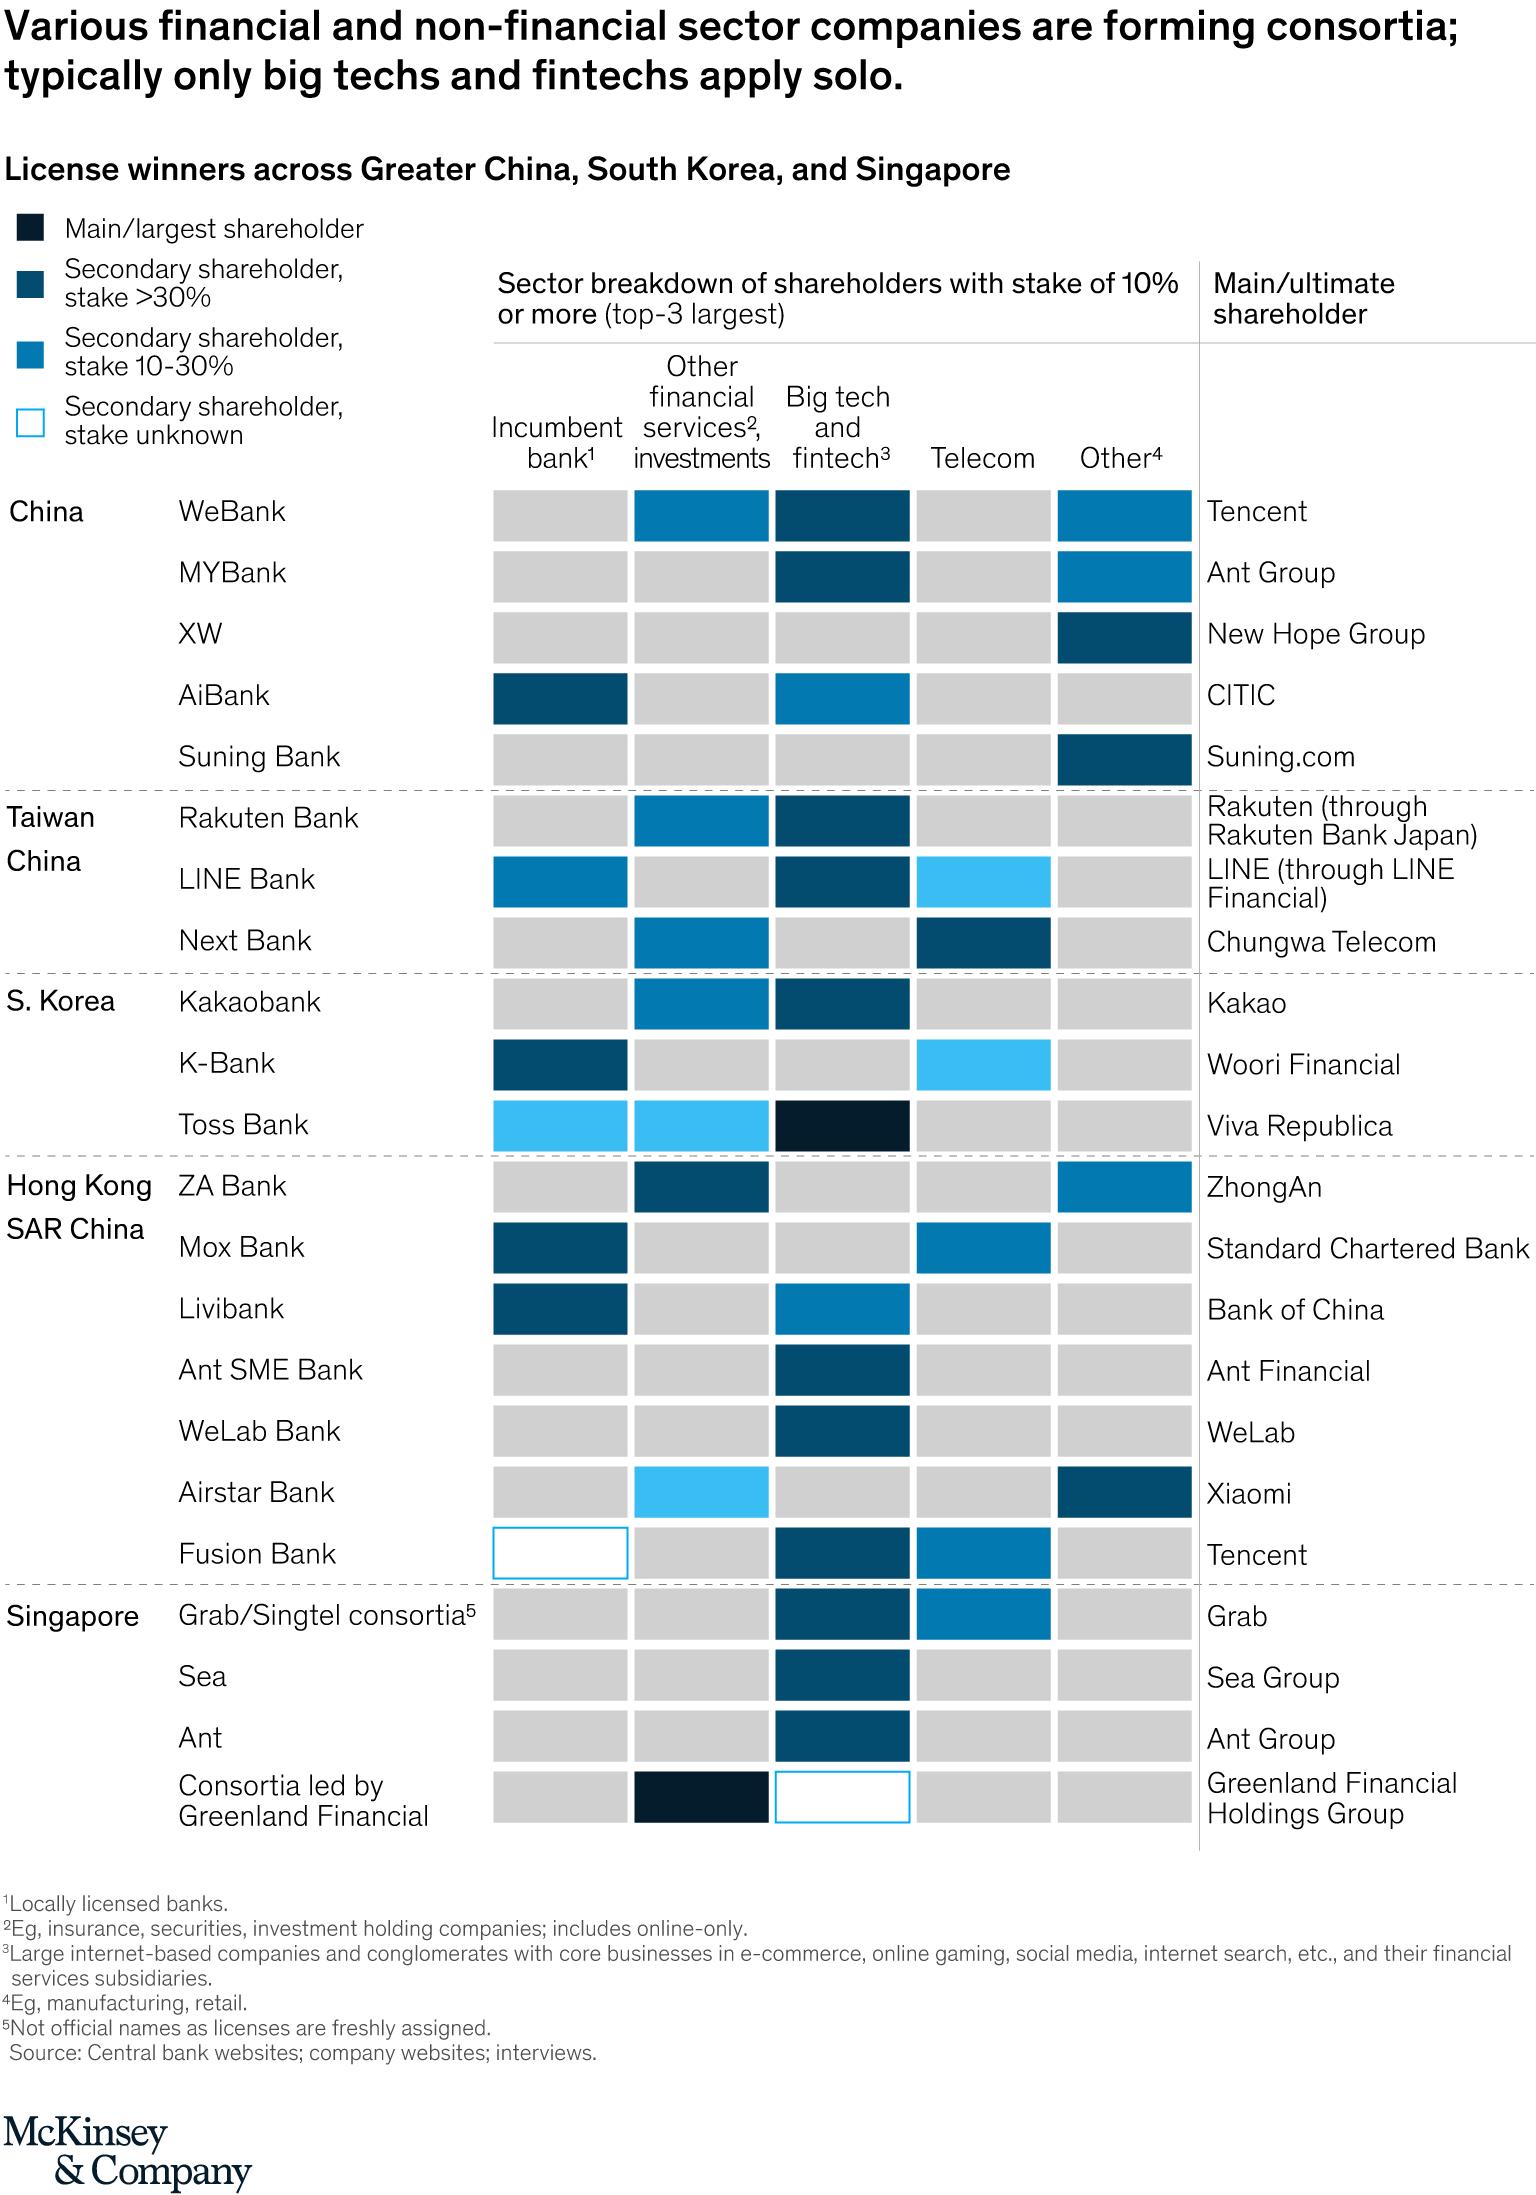 Digital banking in Asia -Digital banking consortia in Asia, McKinsey, Jan 2021